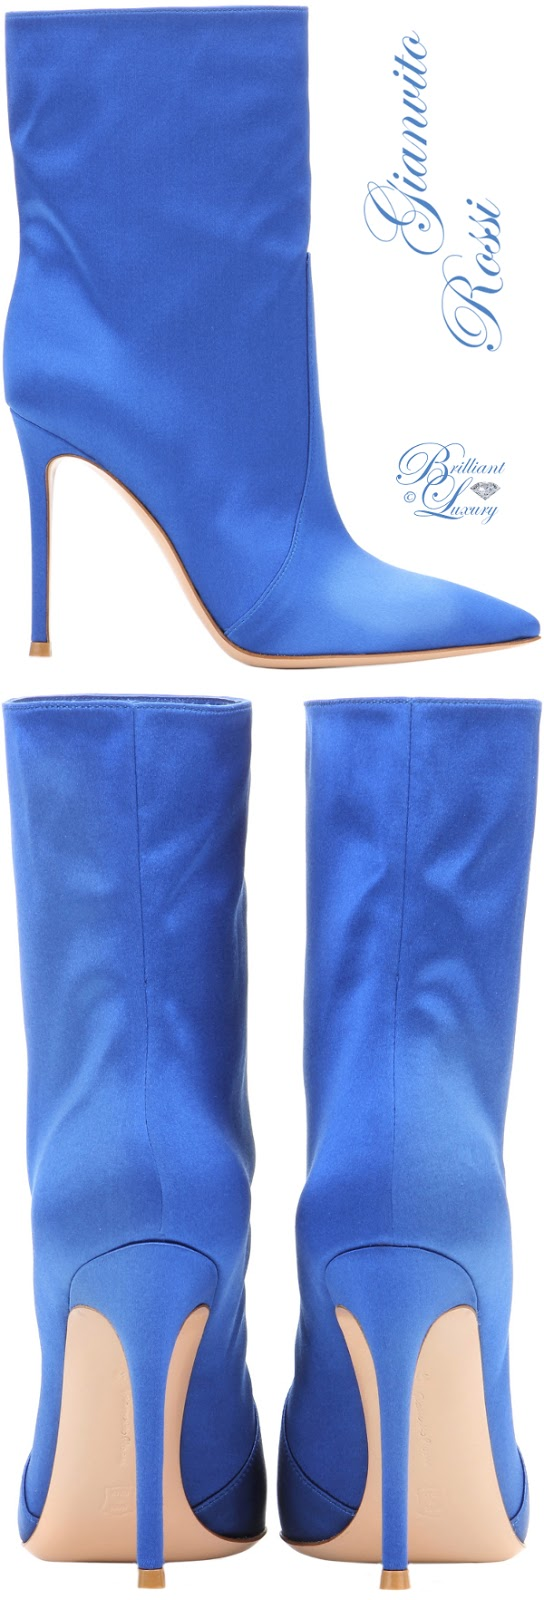 Brilliant Luxury ♦ Gianvito Rossi Melanie Satin Ankle Boots